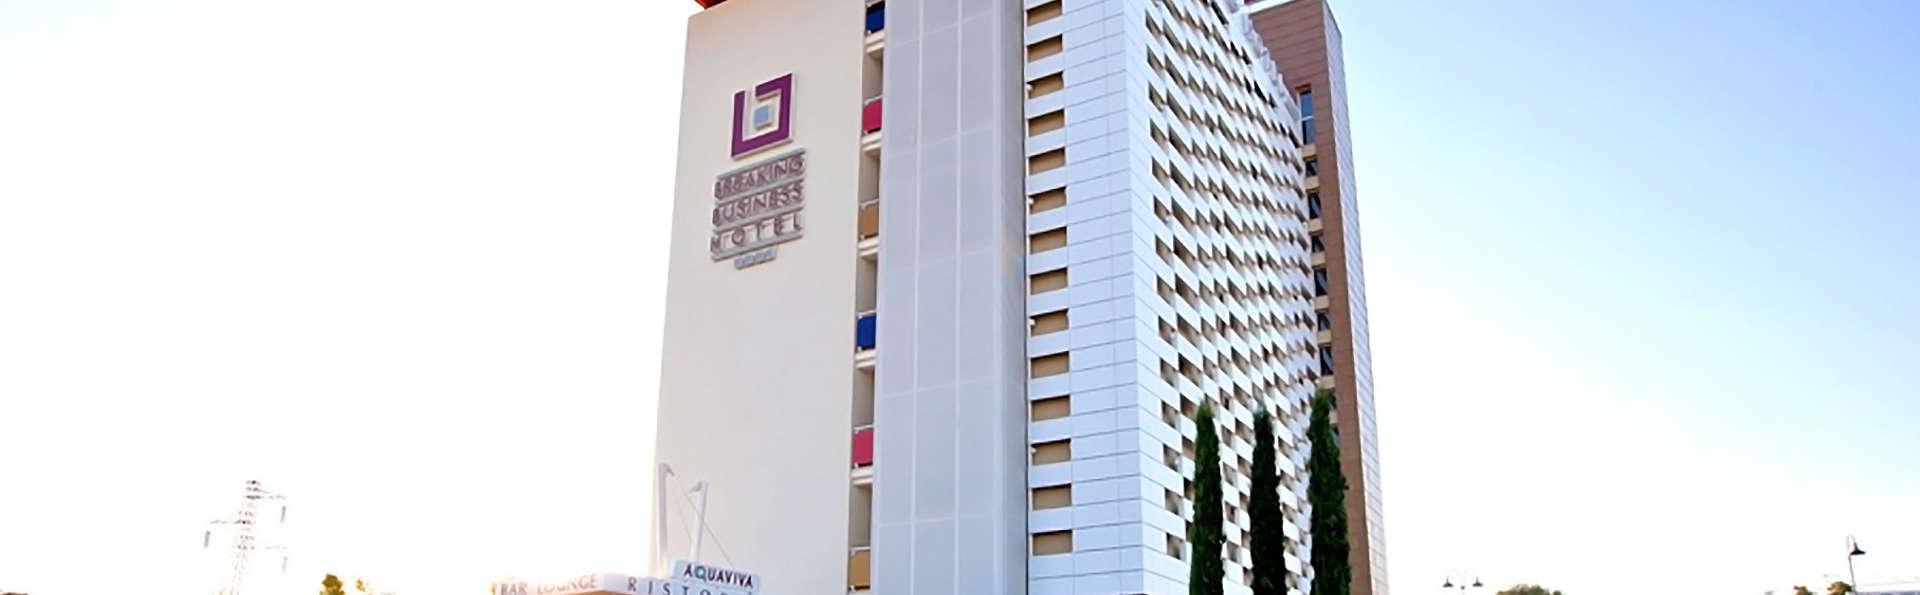 Breaking Business Hotel - edit_front.jpg